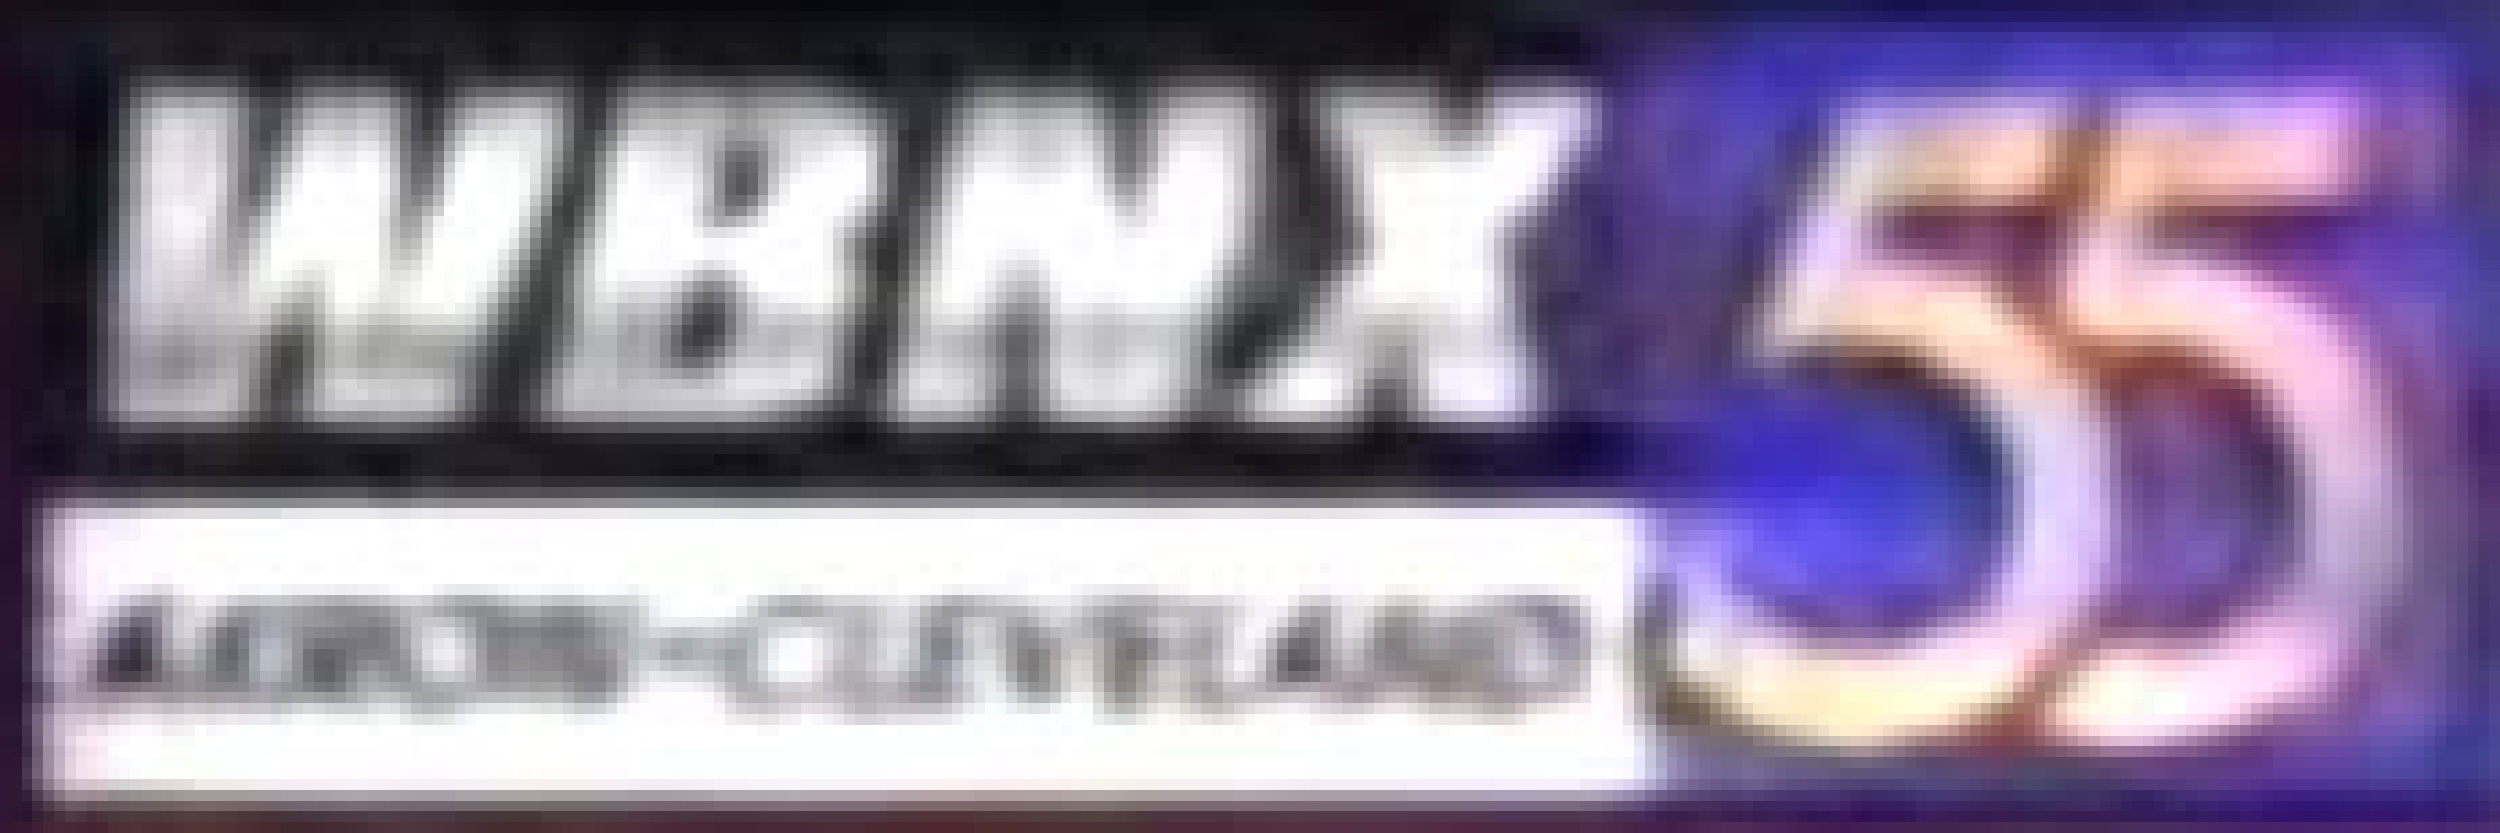 File:WBNX Logo 1995 b.jpg